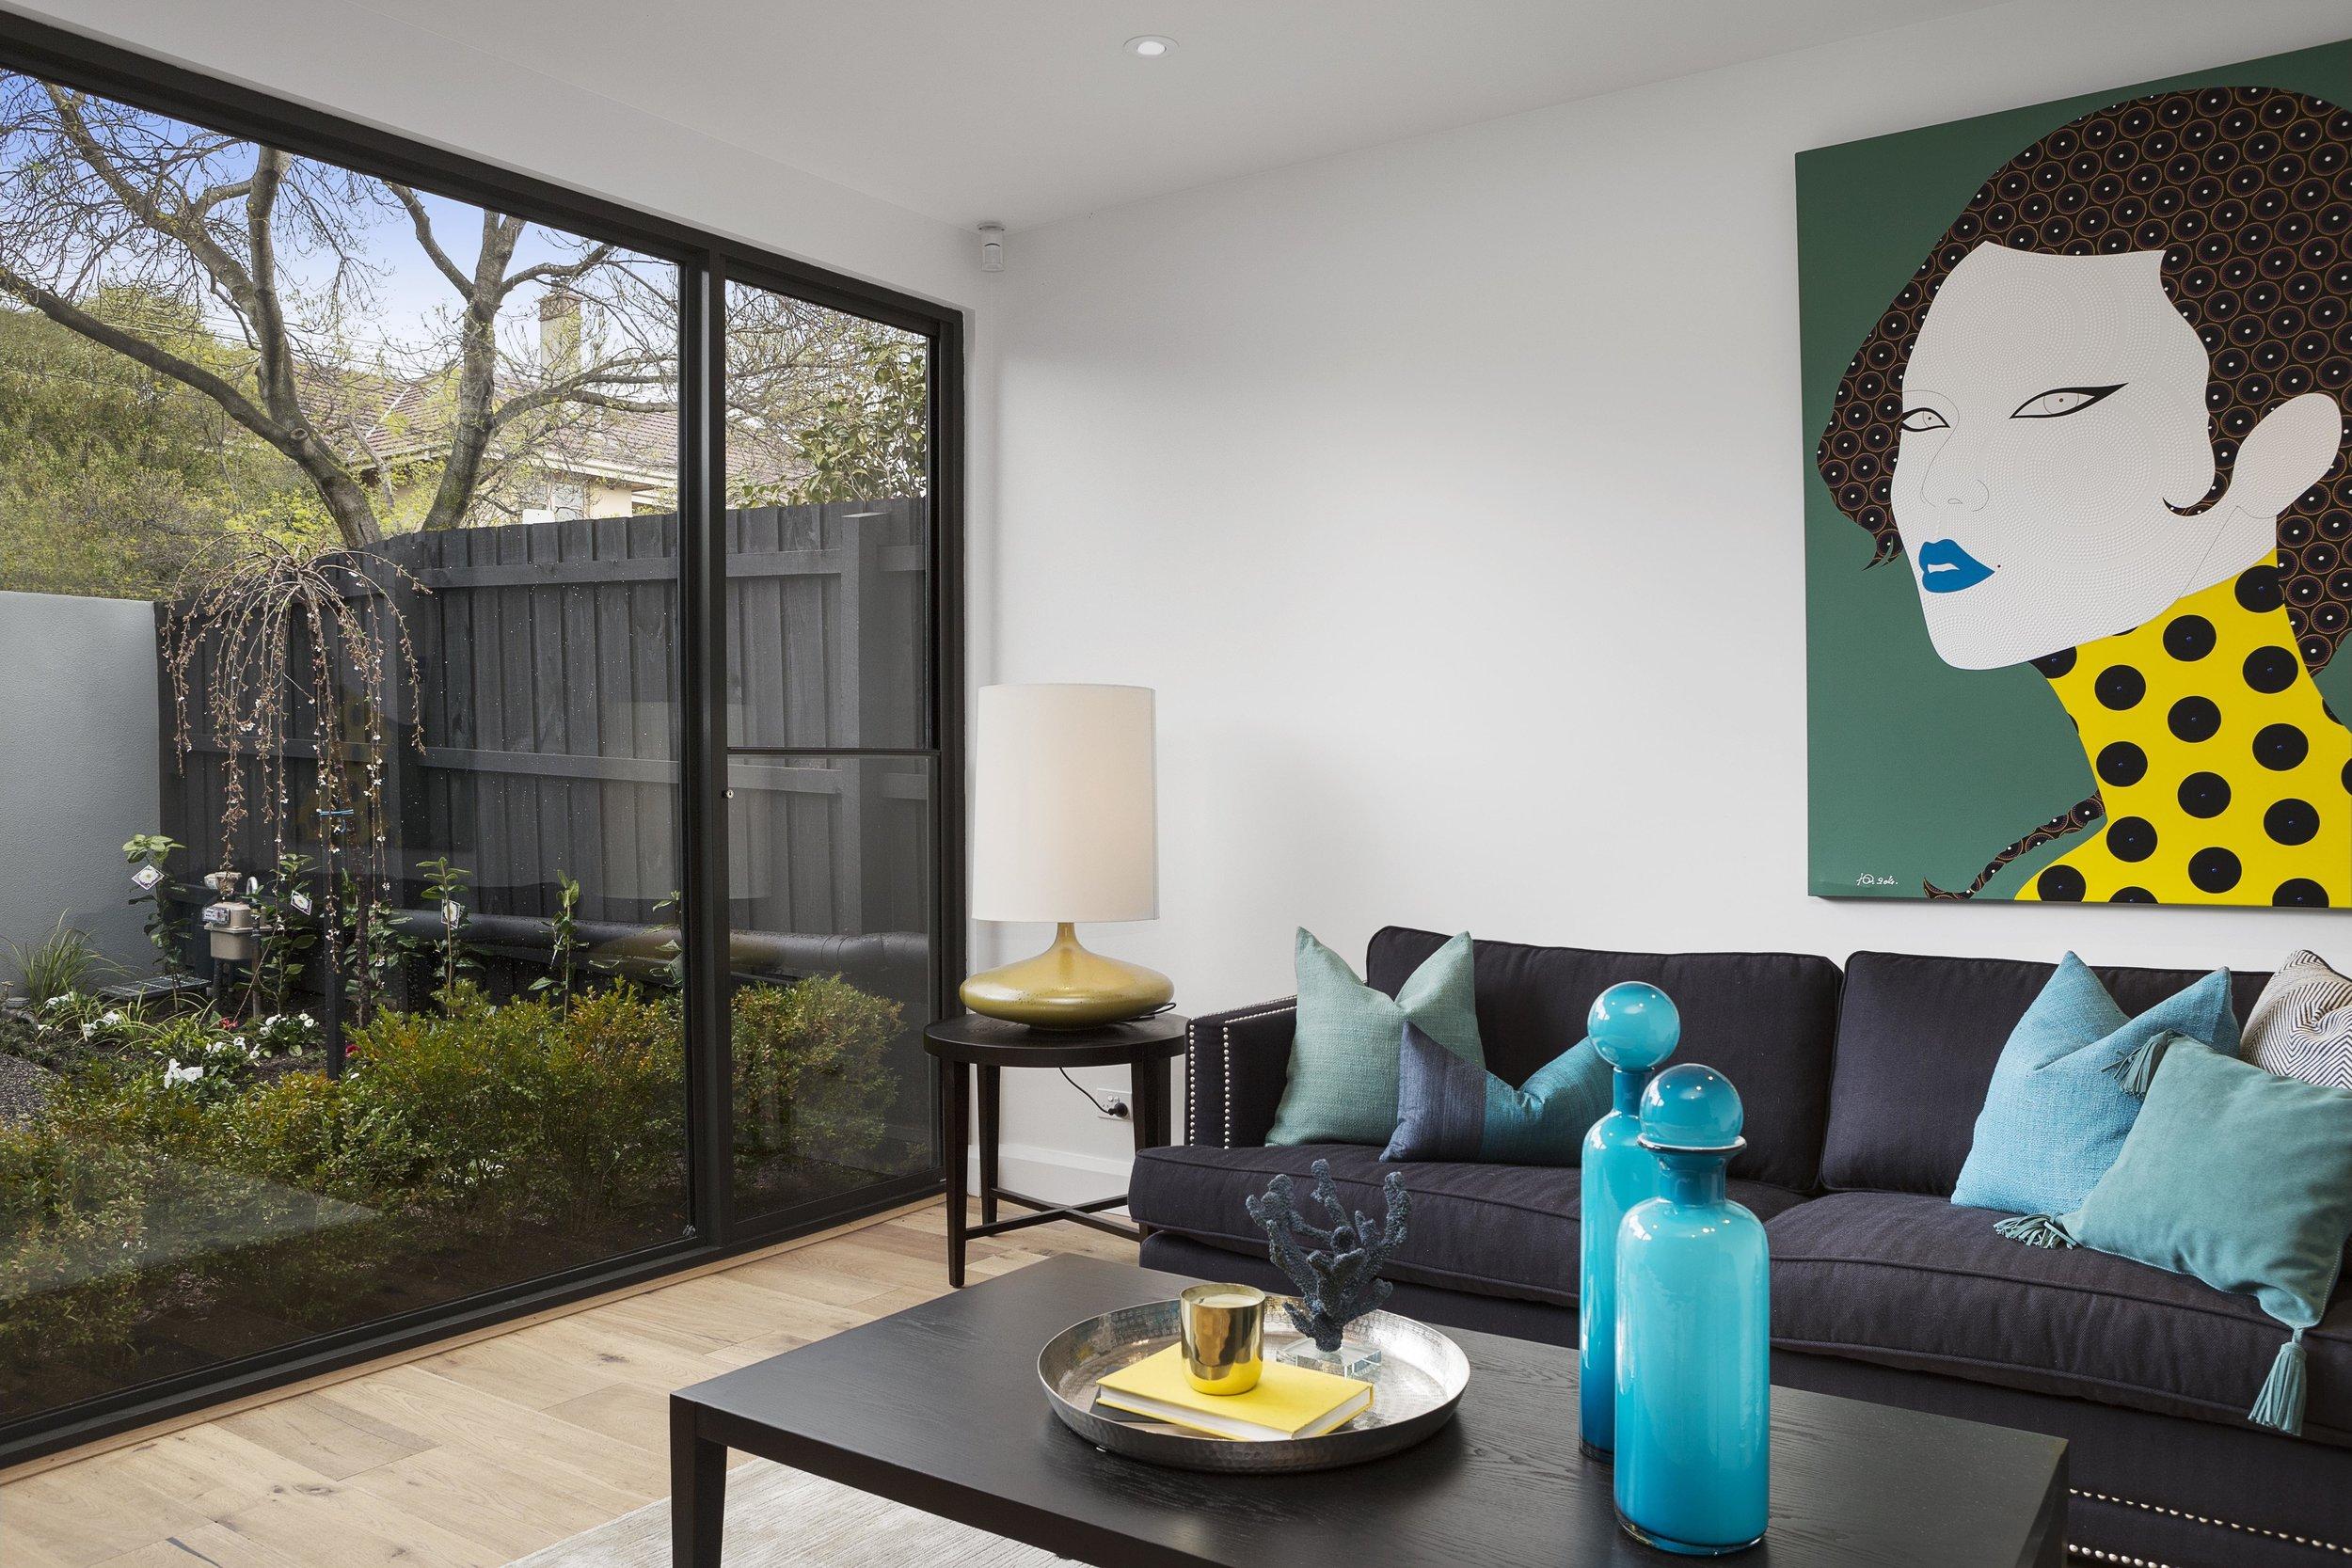 Armadale-Residence-Guymer-Bailey-Architects-02.jpg